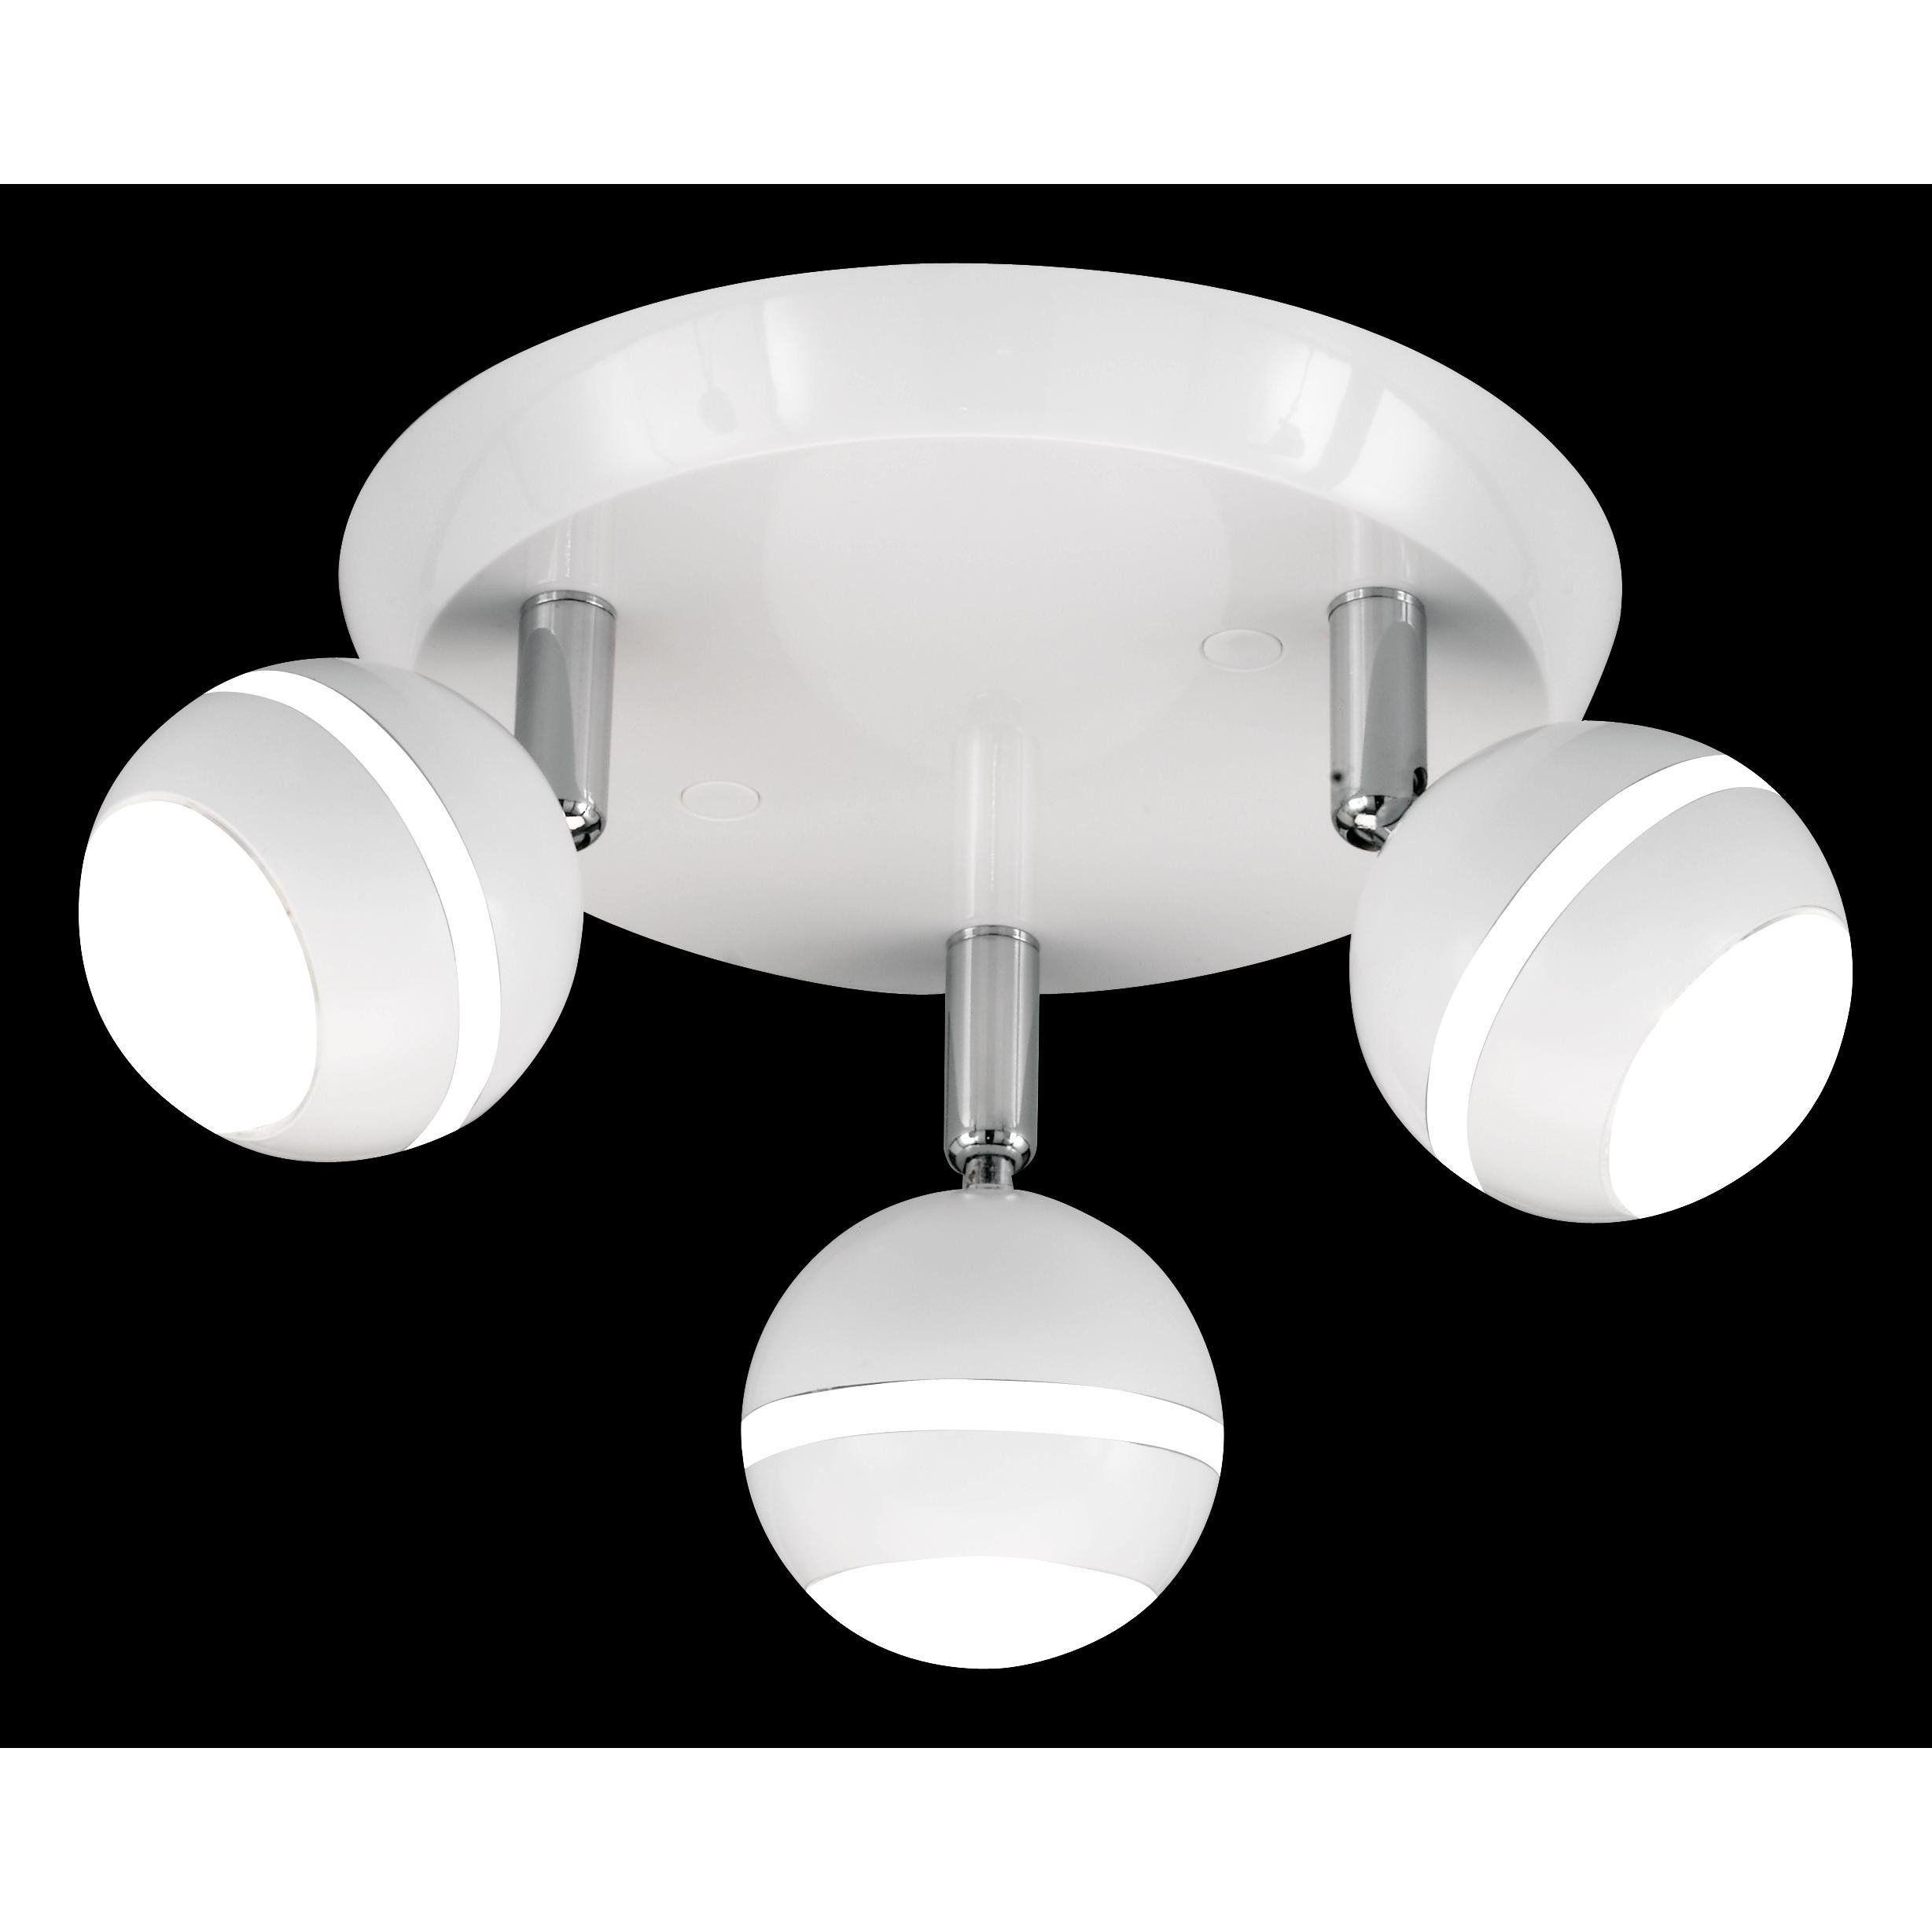 Trio Spottivalaisin LED (3-os, valkoinen)